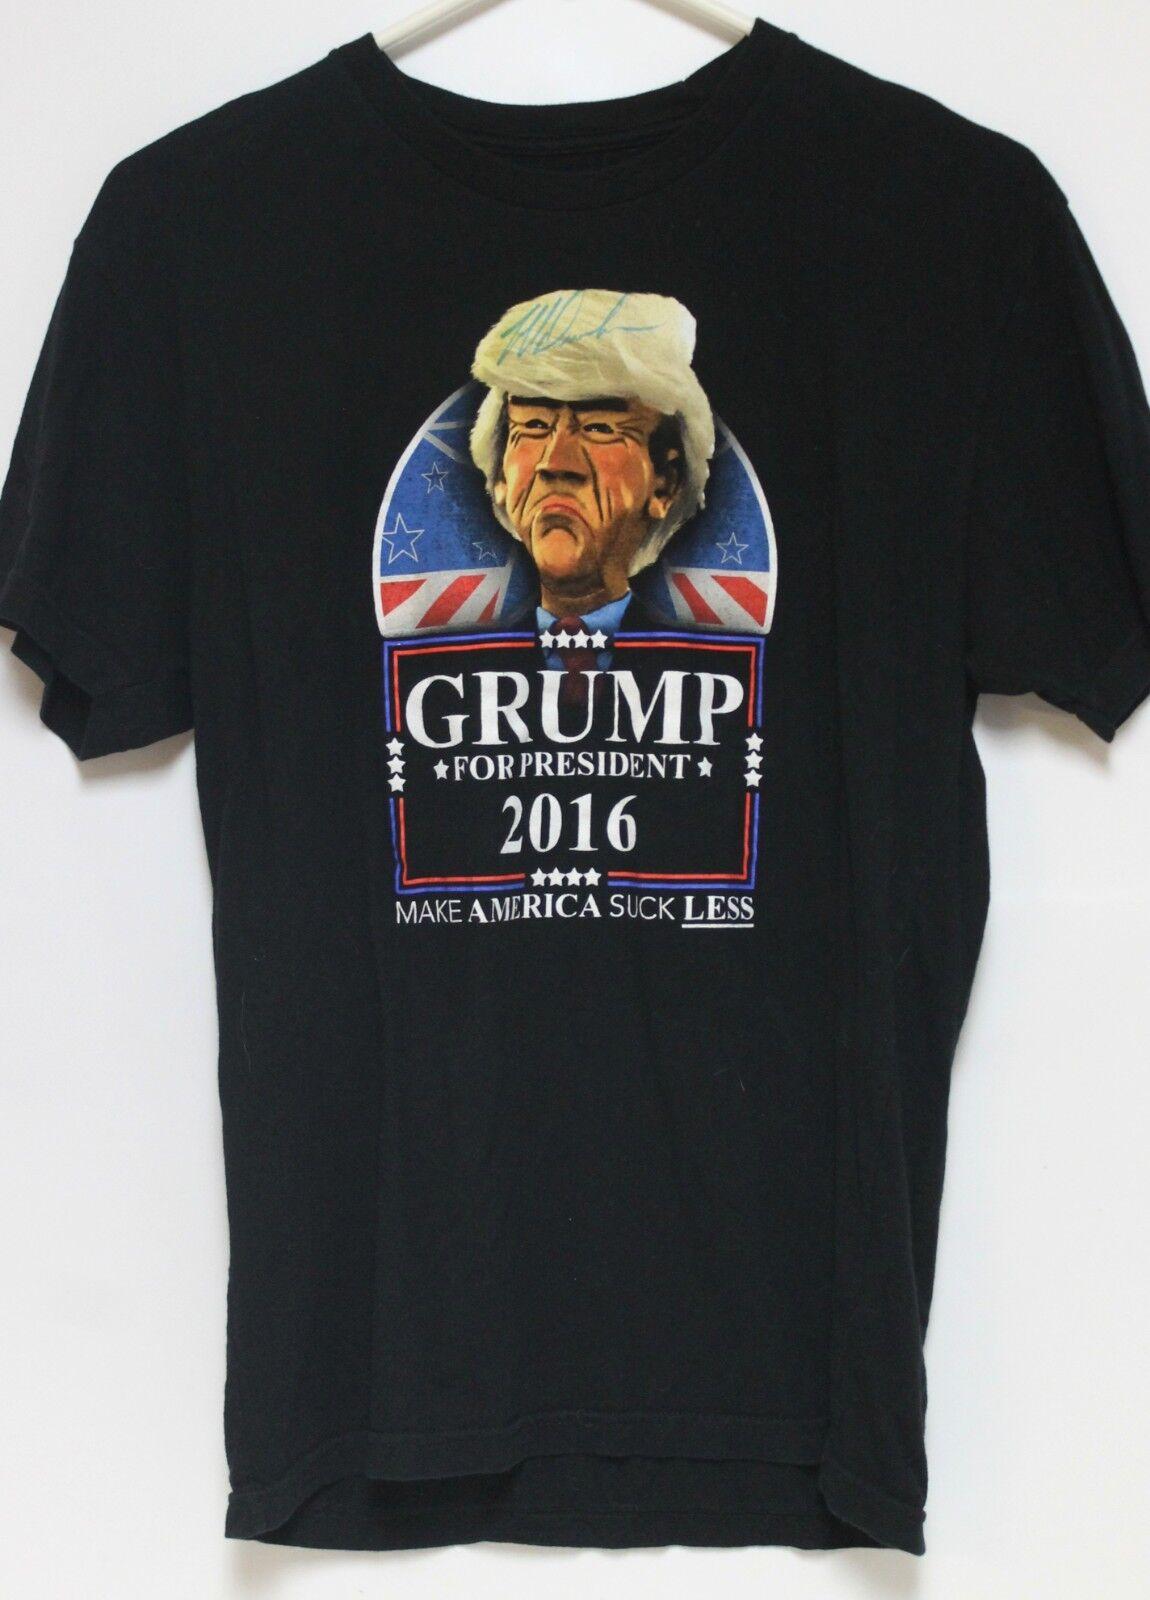 Jeff Dunham Signed T Shirt Walter Grump President 2016 Small